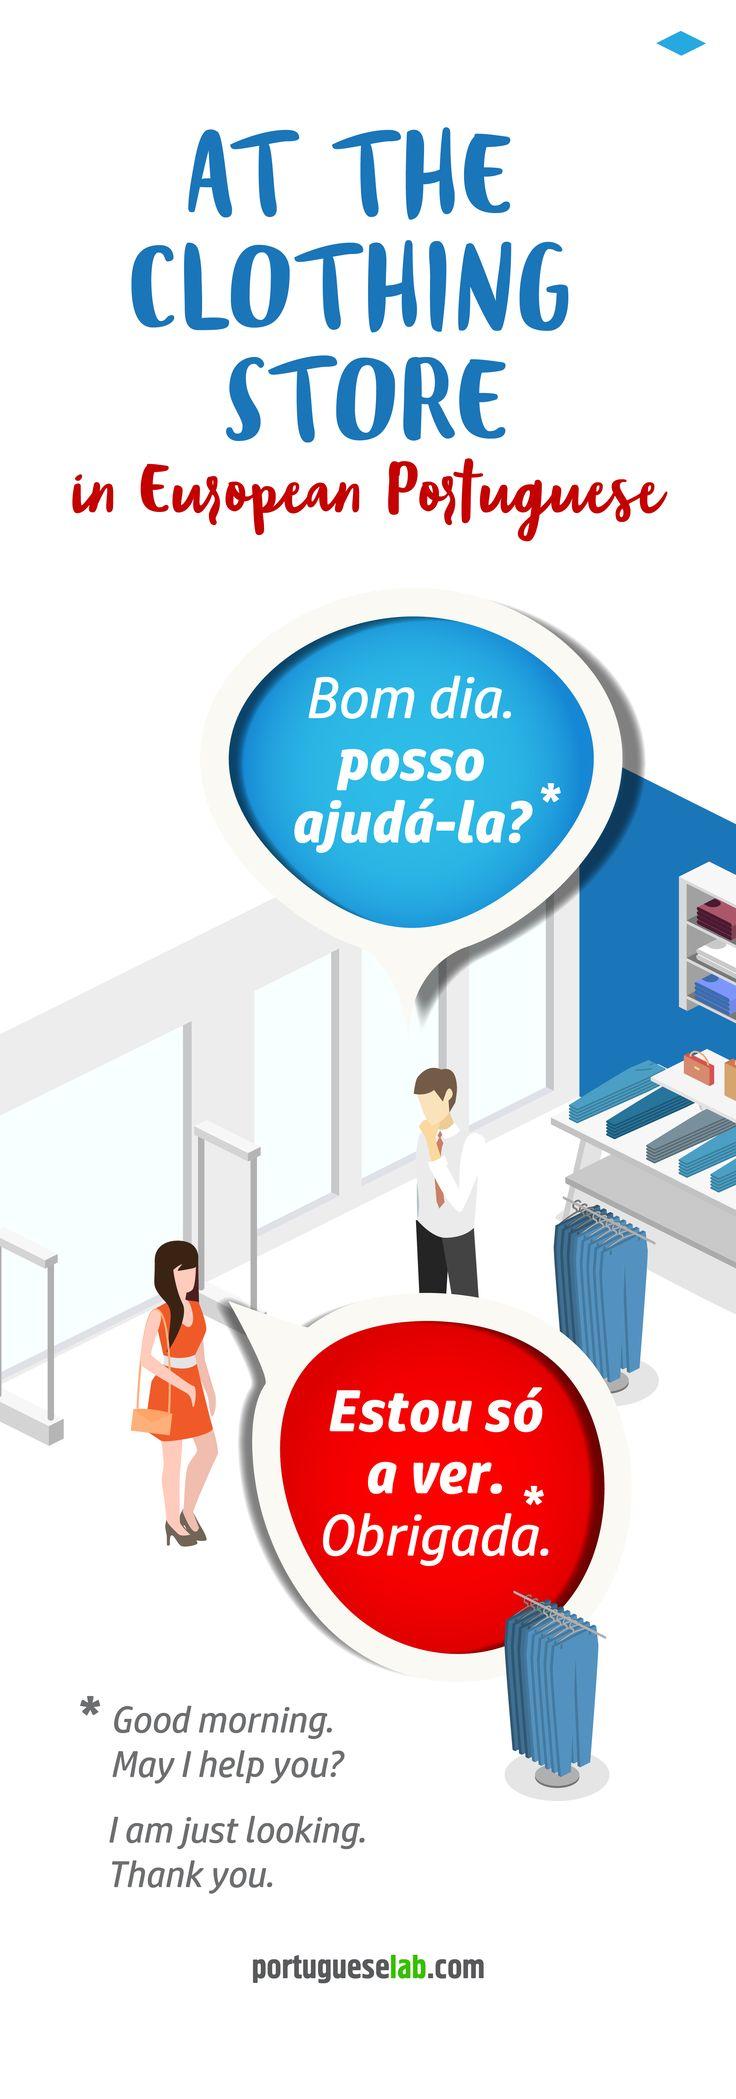 Learn to speak portuguese apparel